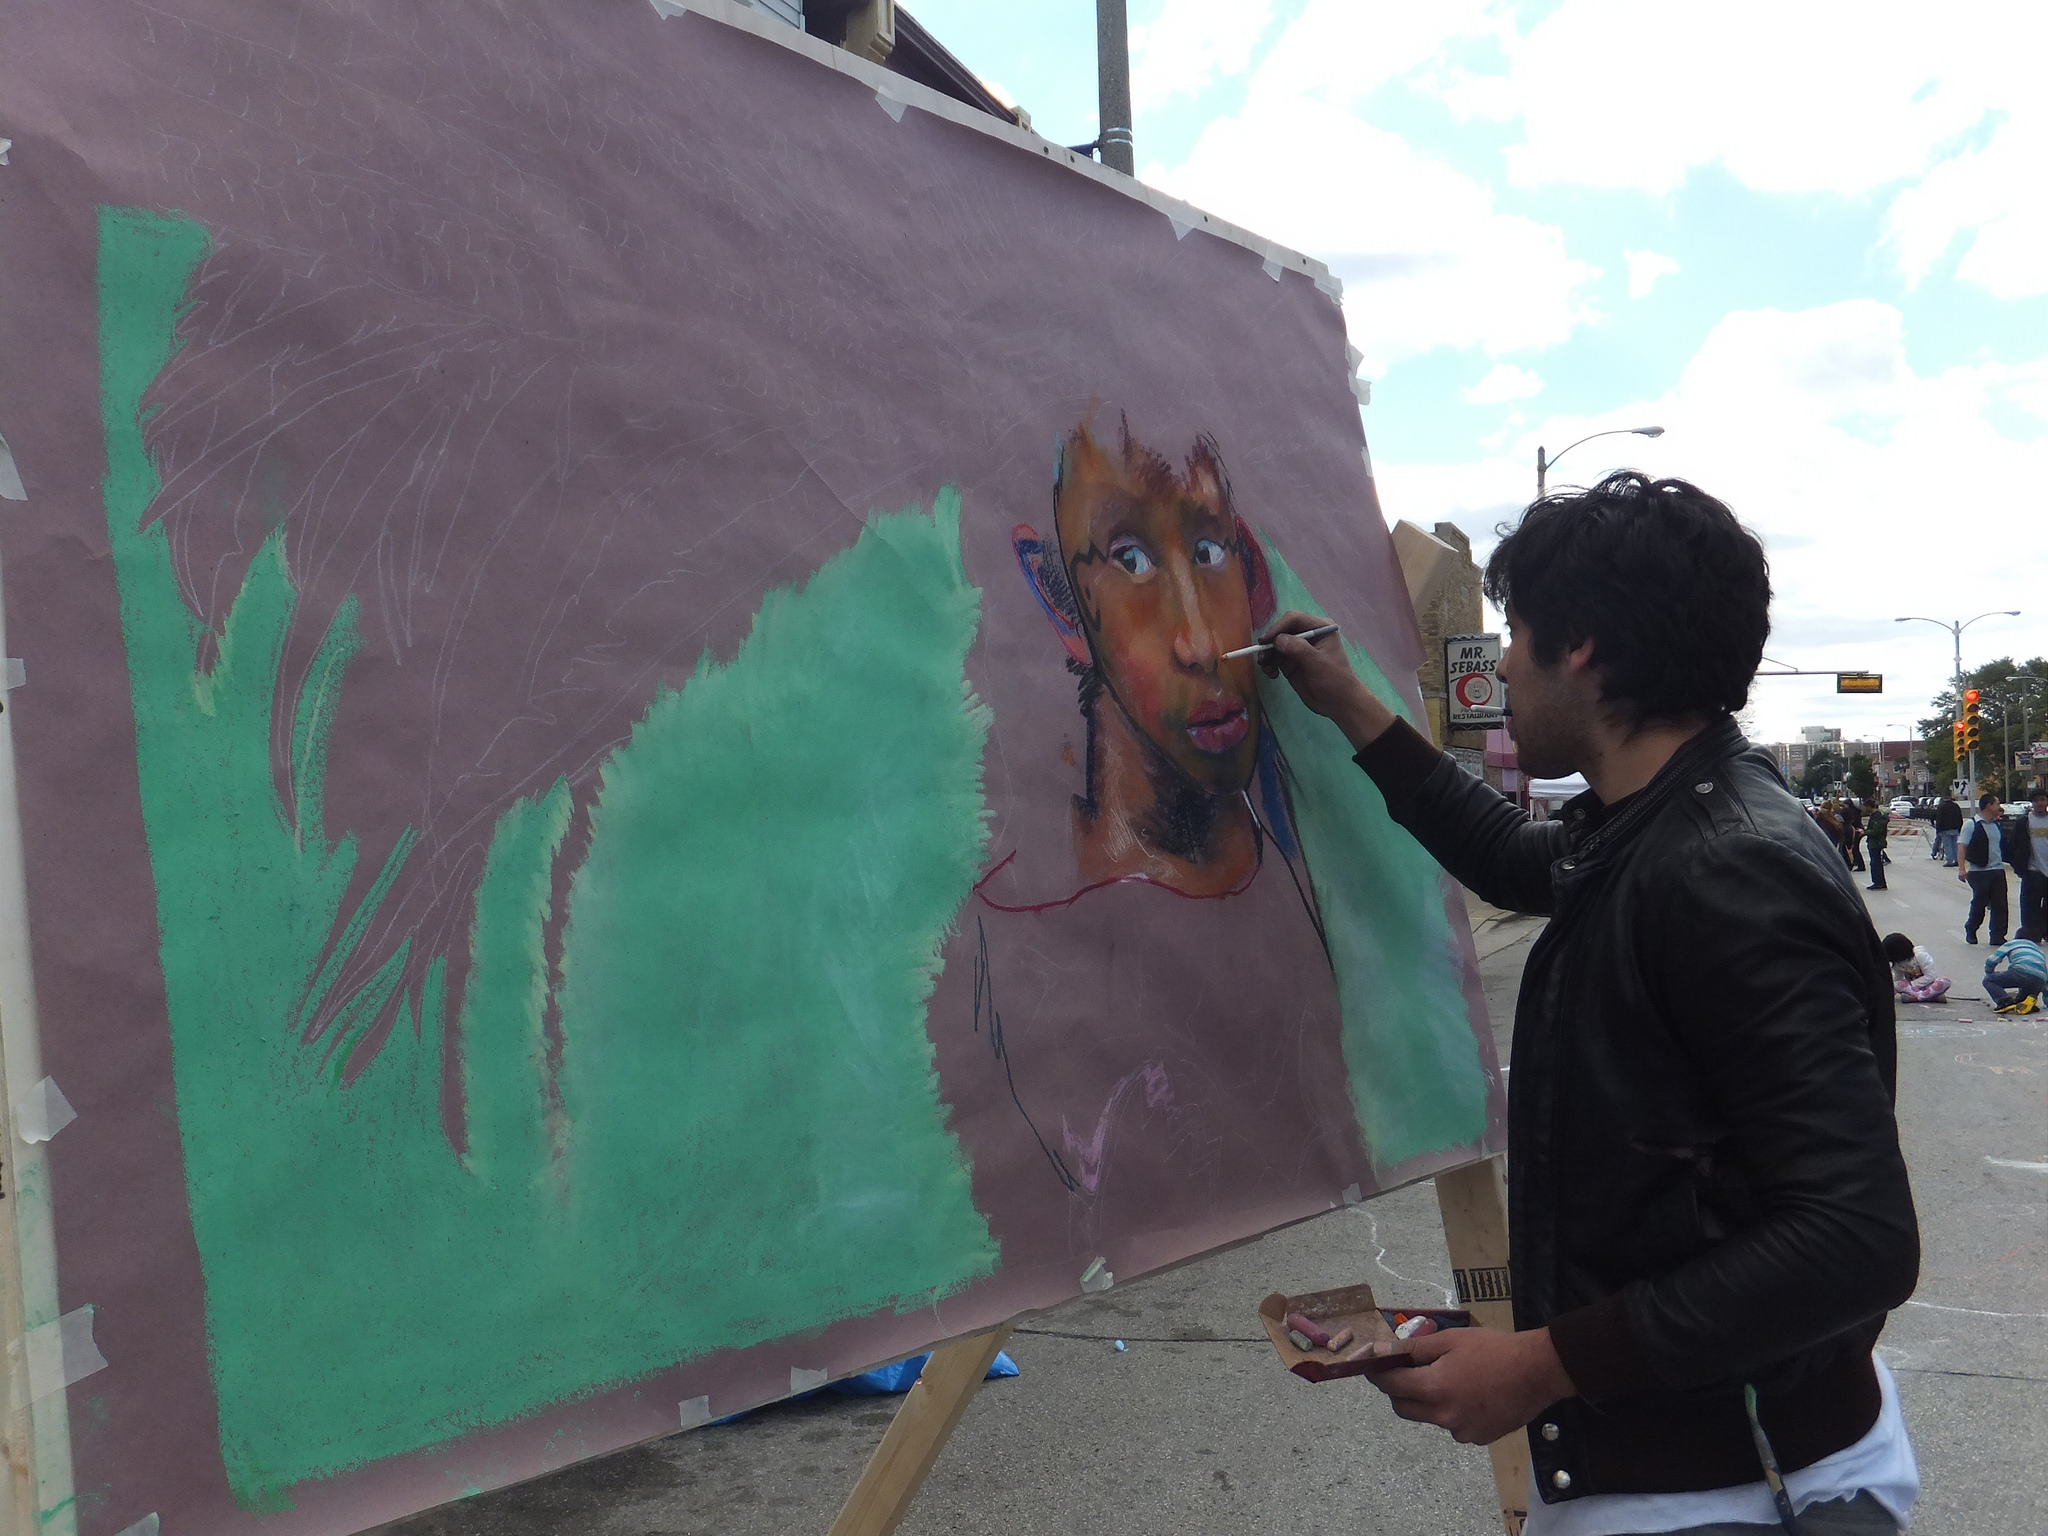 Artist Sydney Romero paints a portrait at the 3rd Annual Silver City International Food & Art Walk. (Photo by Teran Powell)